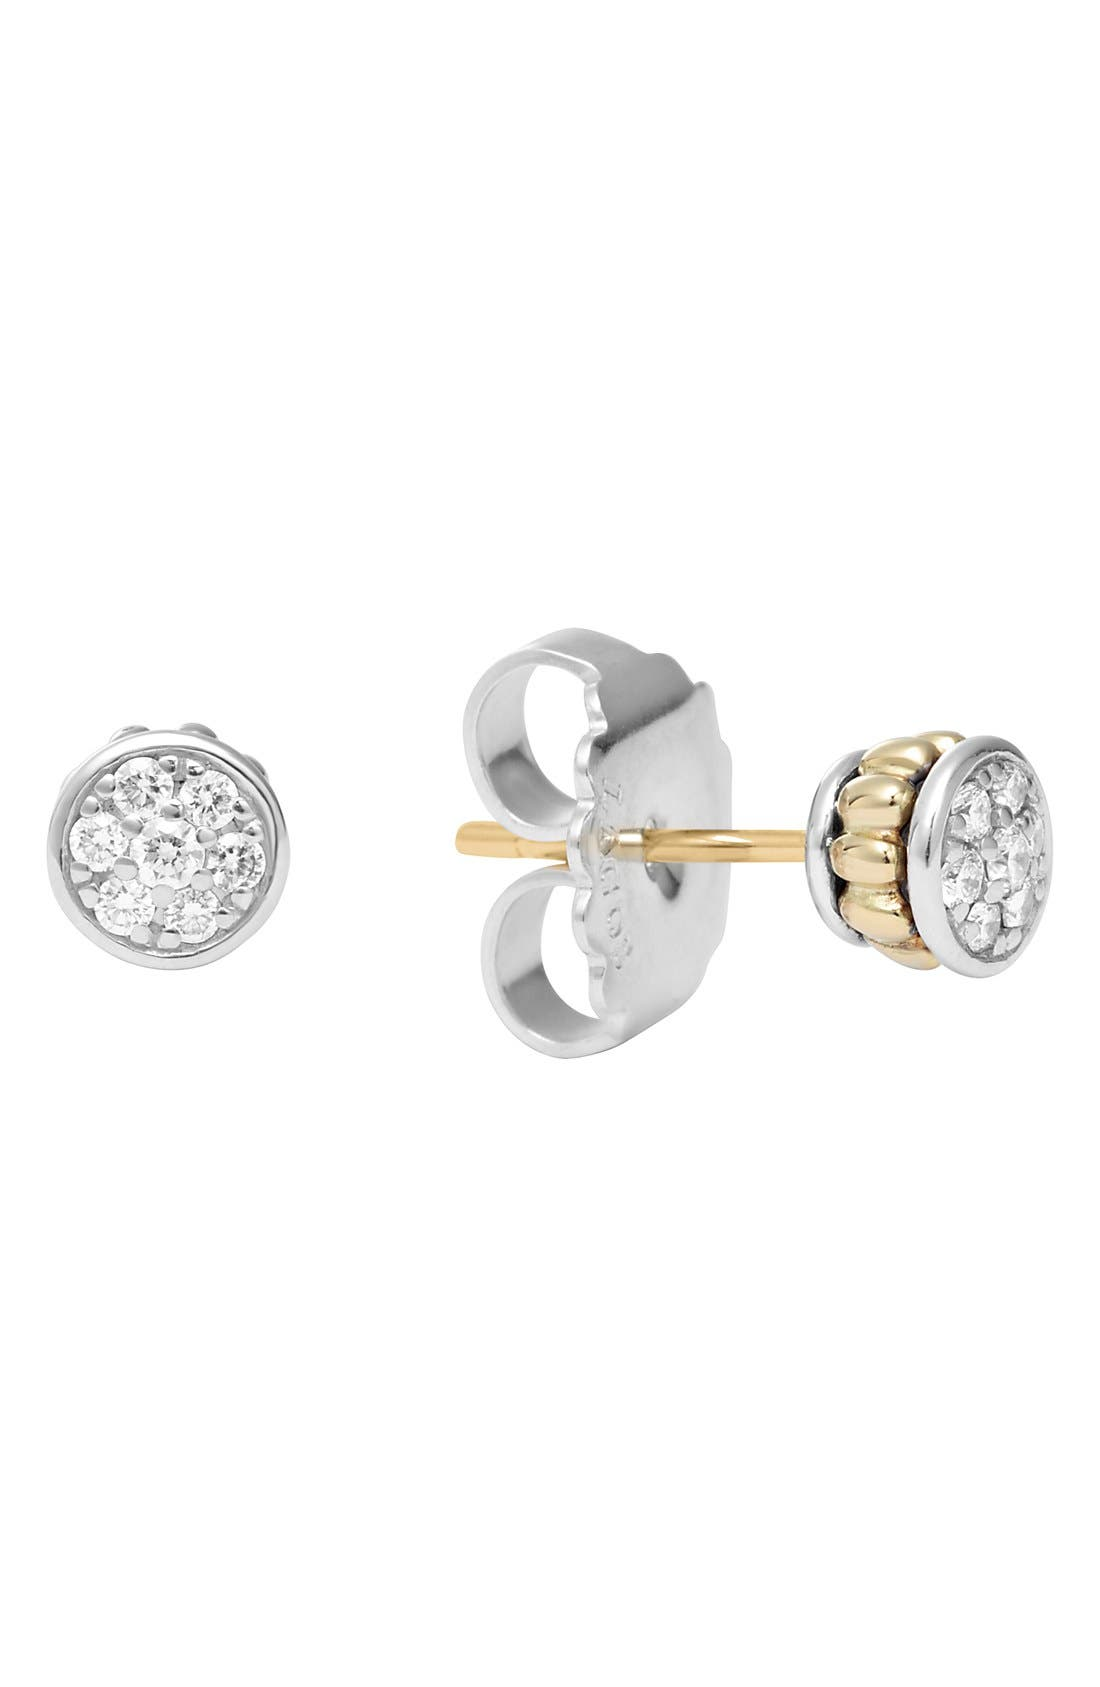 Diamond & Caviar Stud Earrings,                             Alternate thumbnail 3, color,                             040